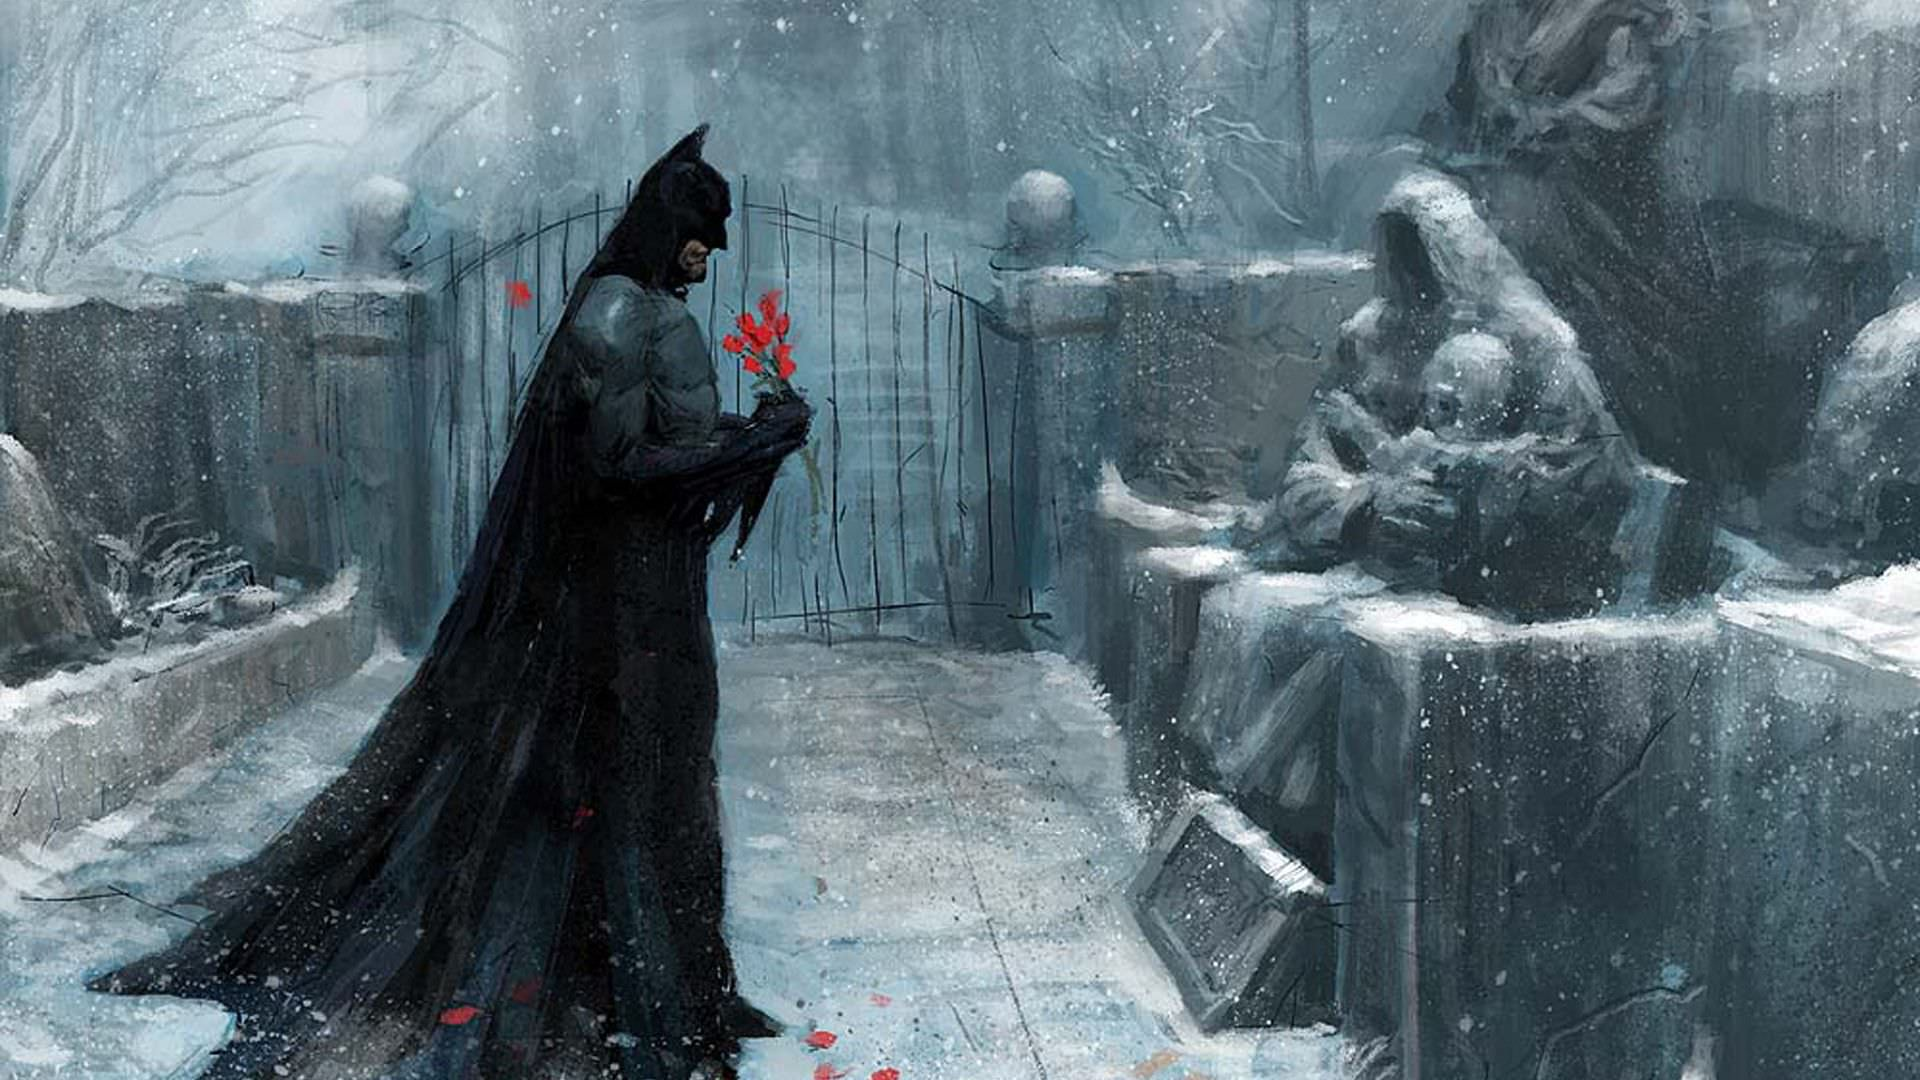 25 Batman Wallpapers Backgrounds Images Design 1920x1080